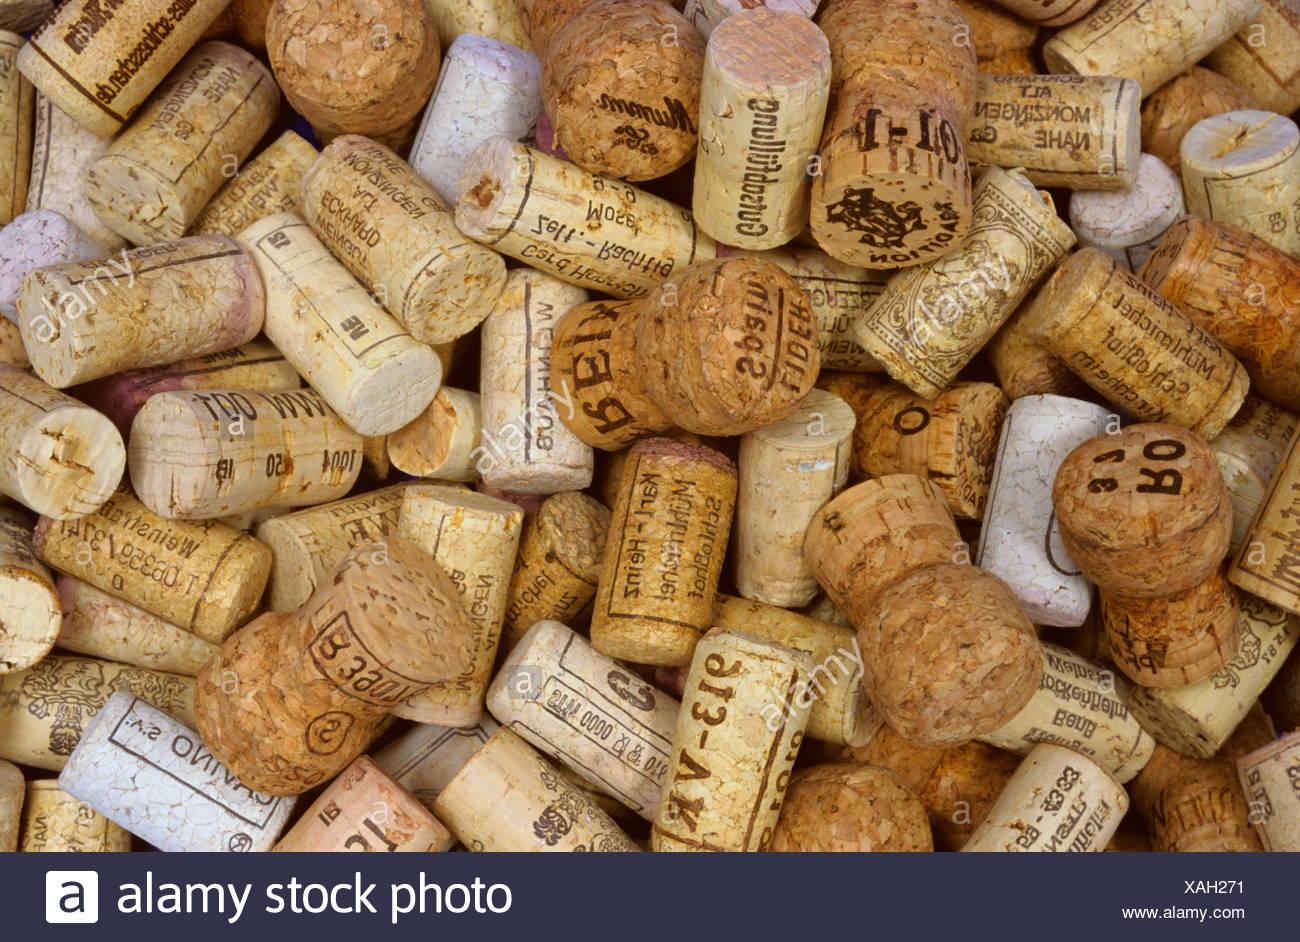 Wine bottle corks - Stock Image